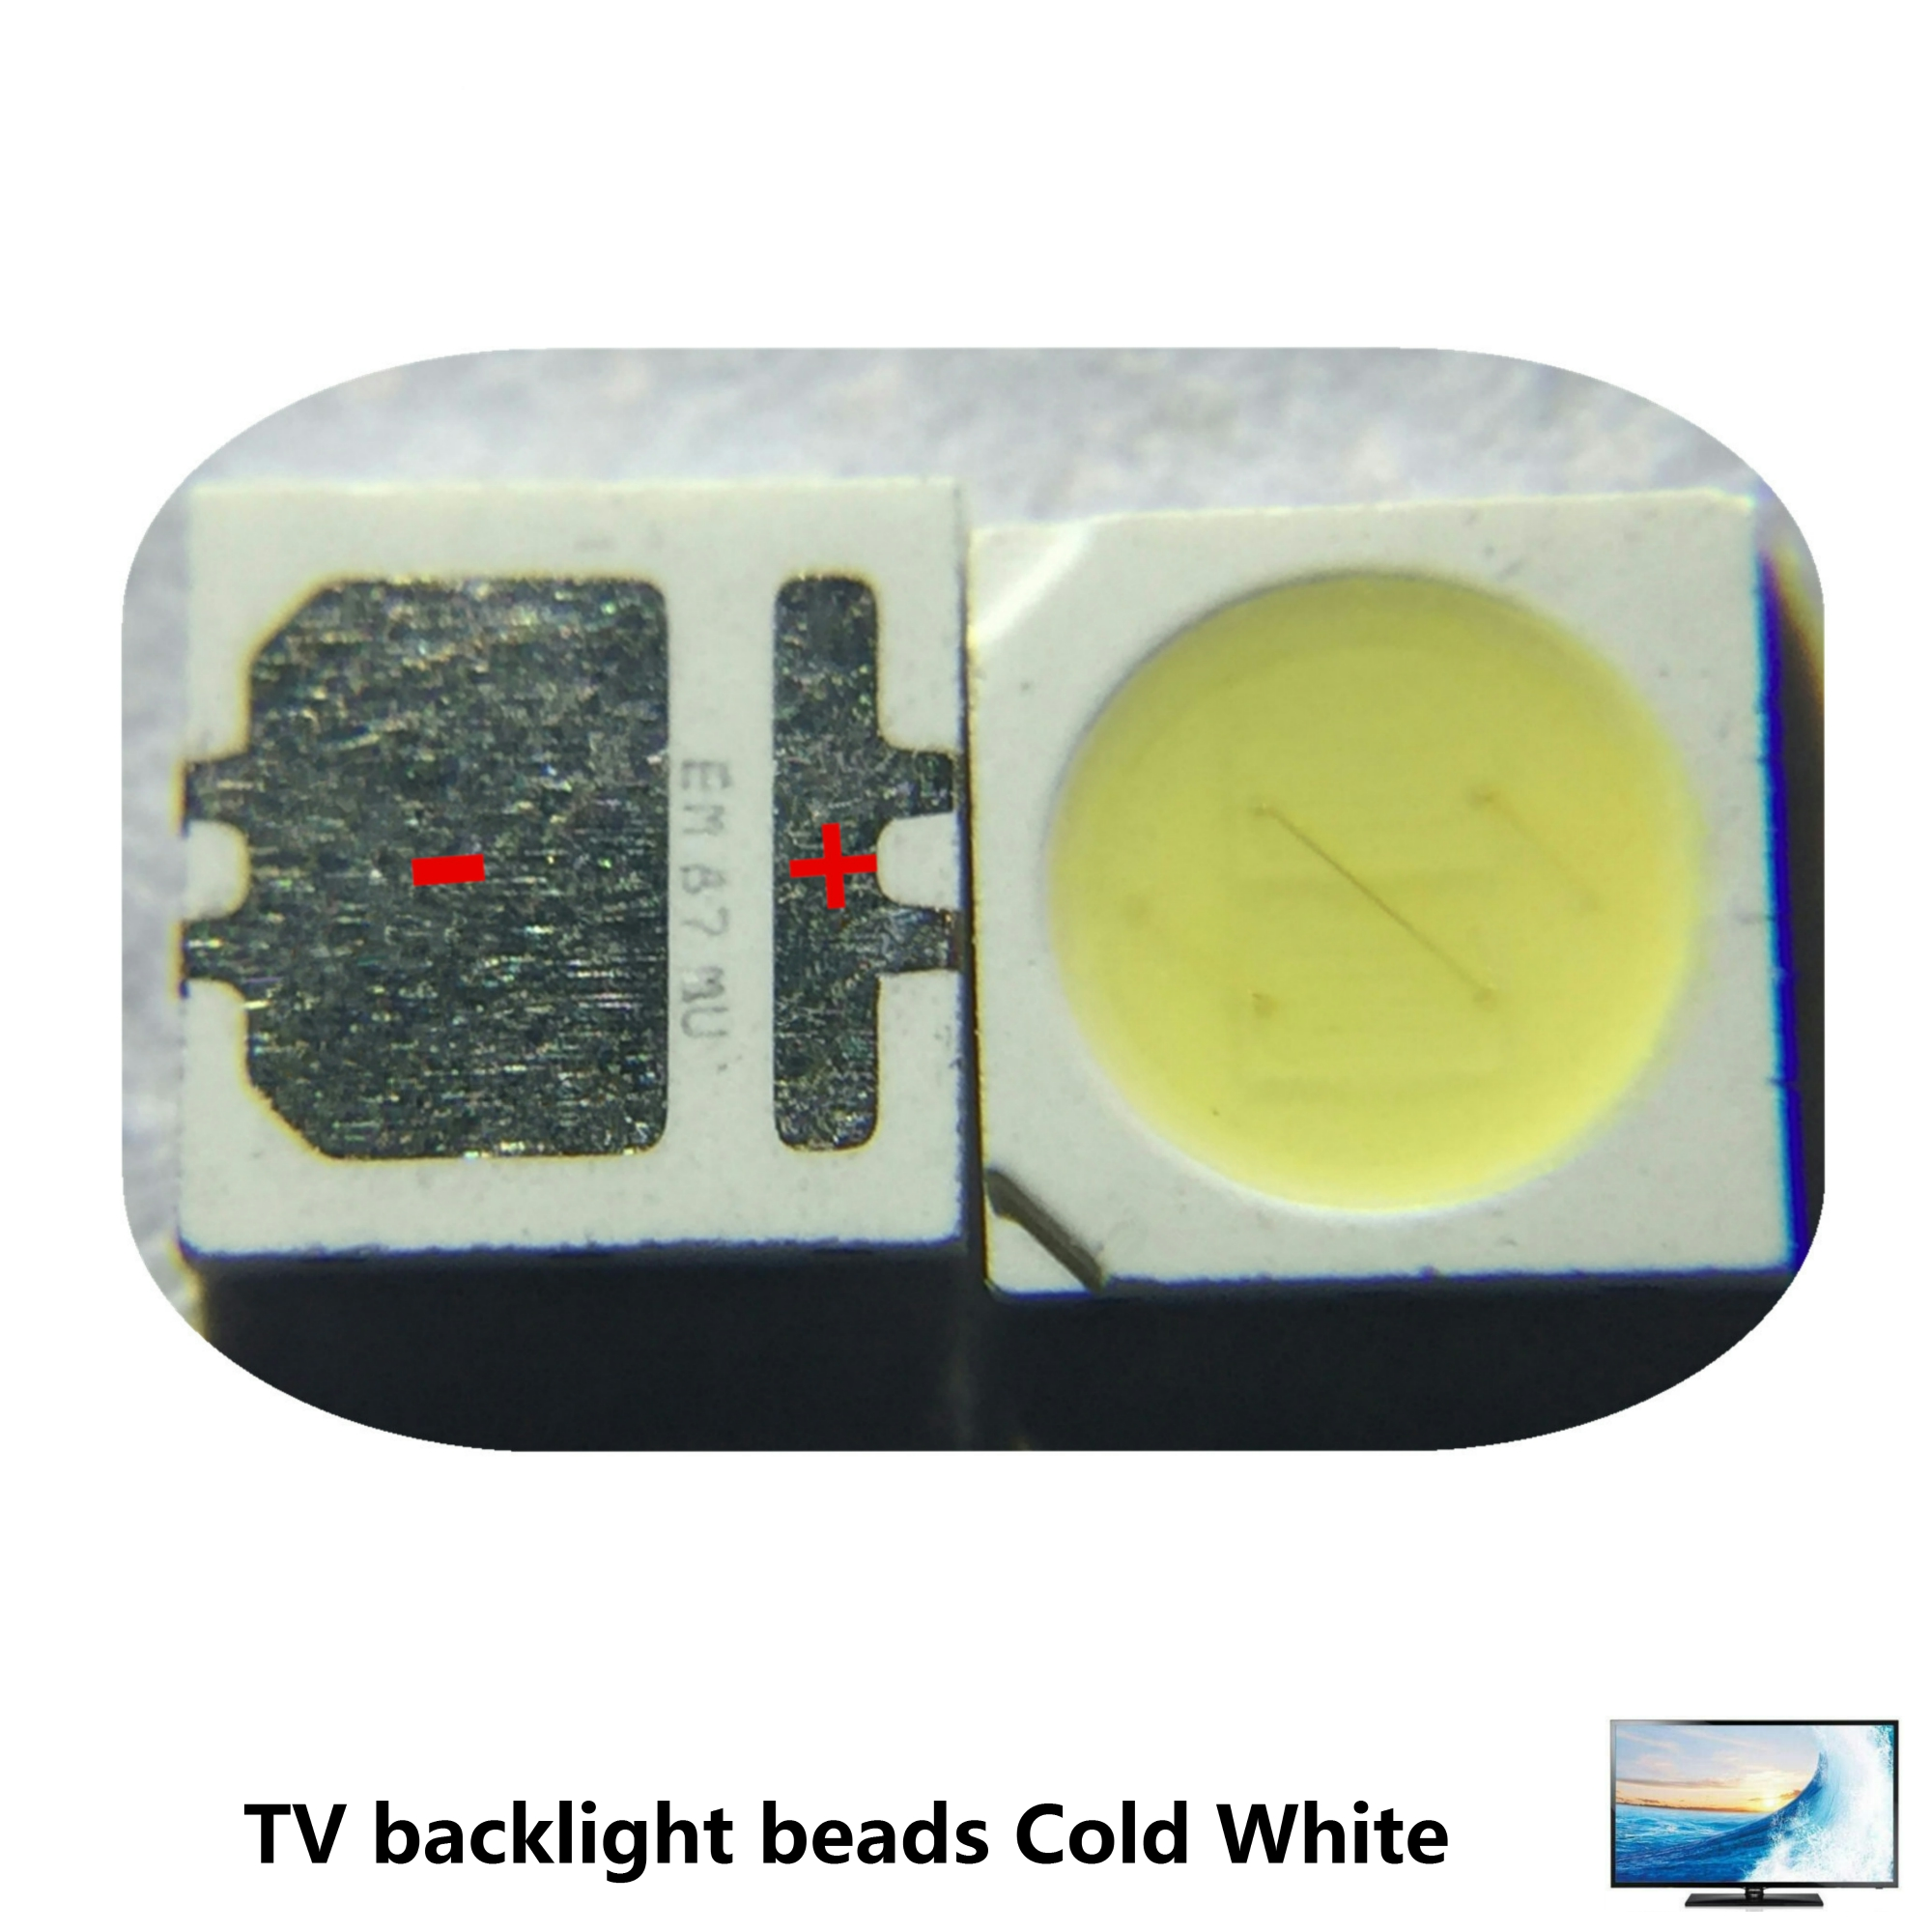 500pcs SEOUL High Power LED LED Backlight 2W 3535 6V Cool white 135LM TV Application SBWVL2S0E New and Original